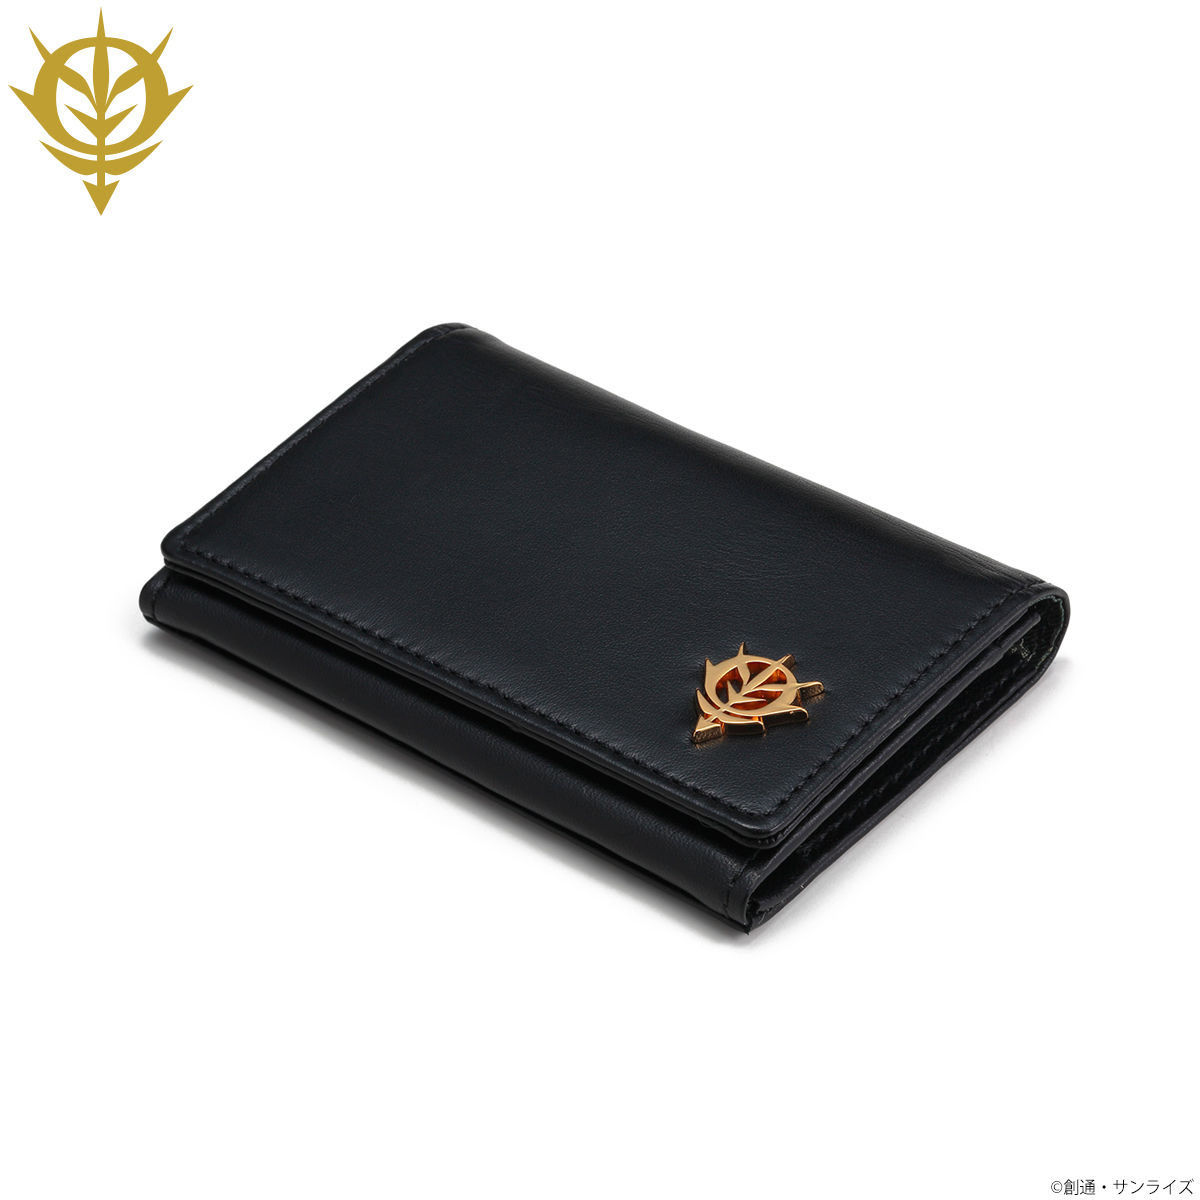 Mobile Suit Gundam Zeon Golden Emblem Business Card Case